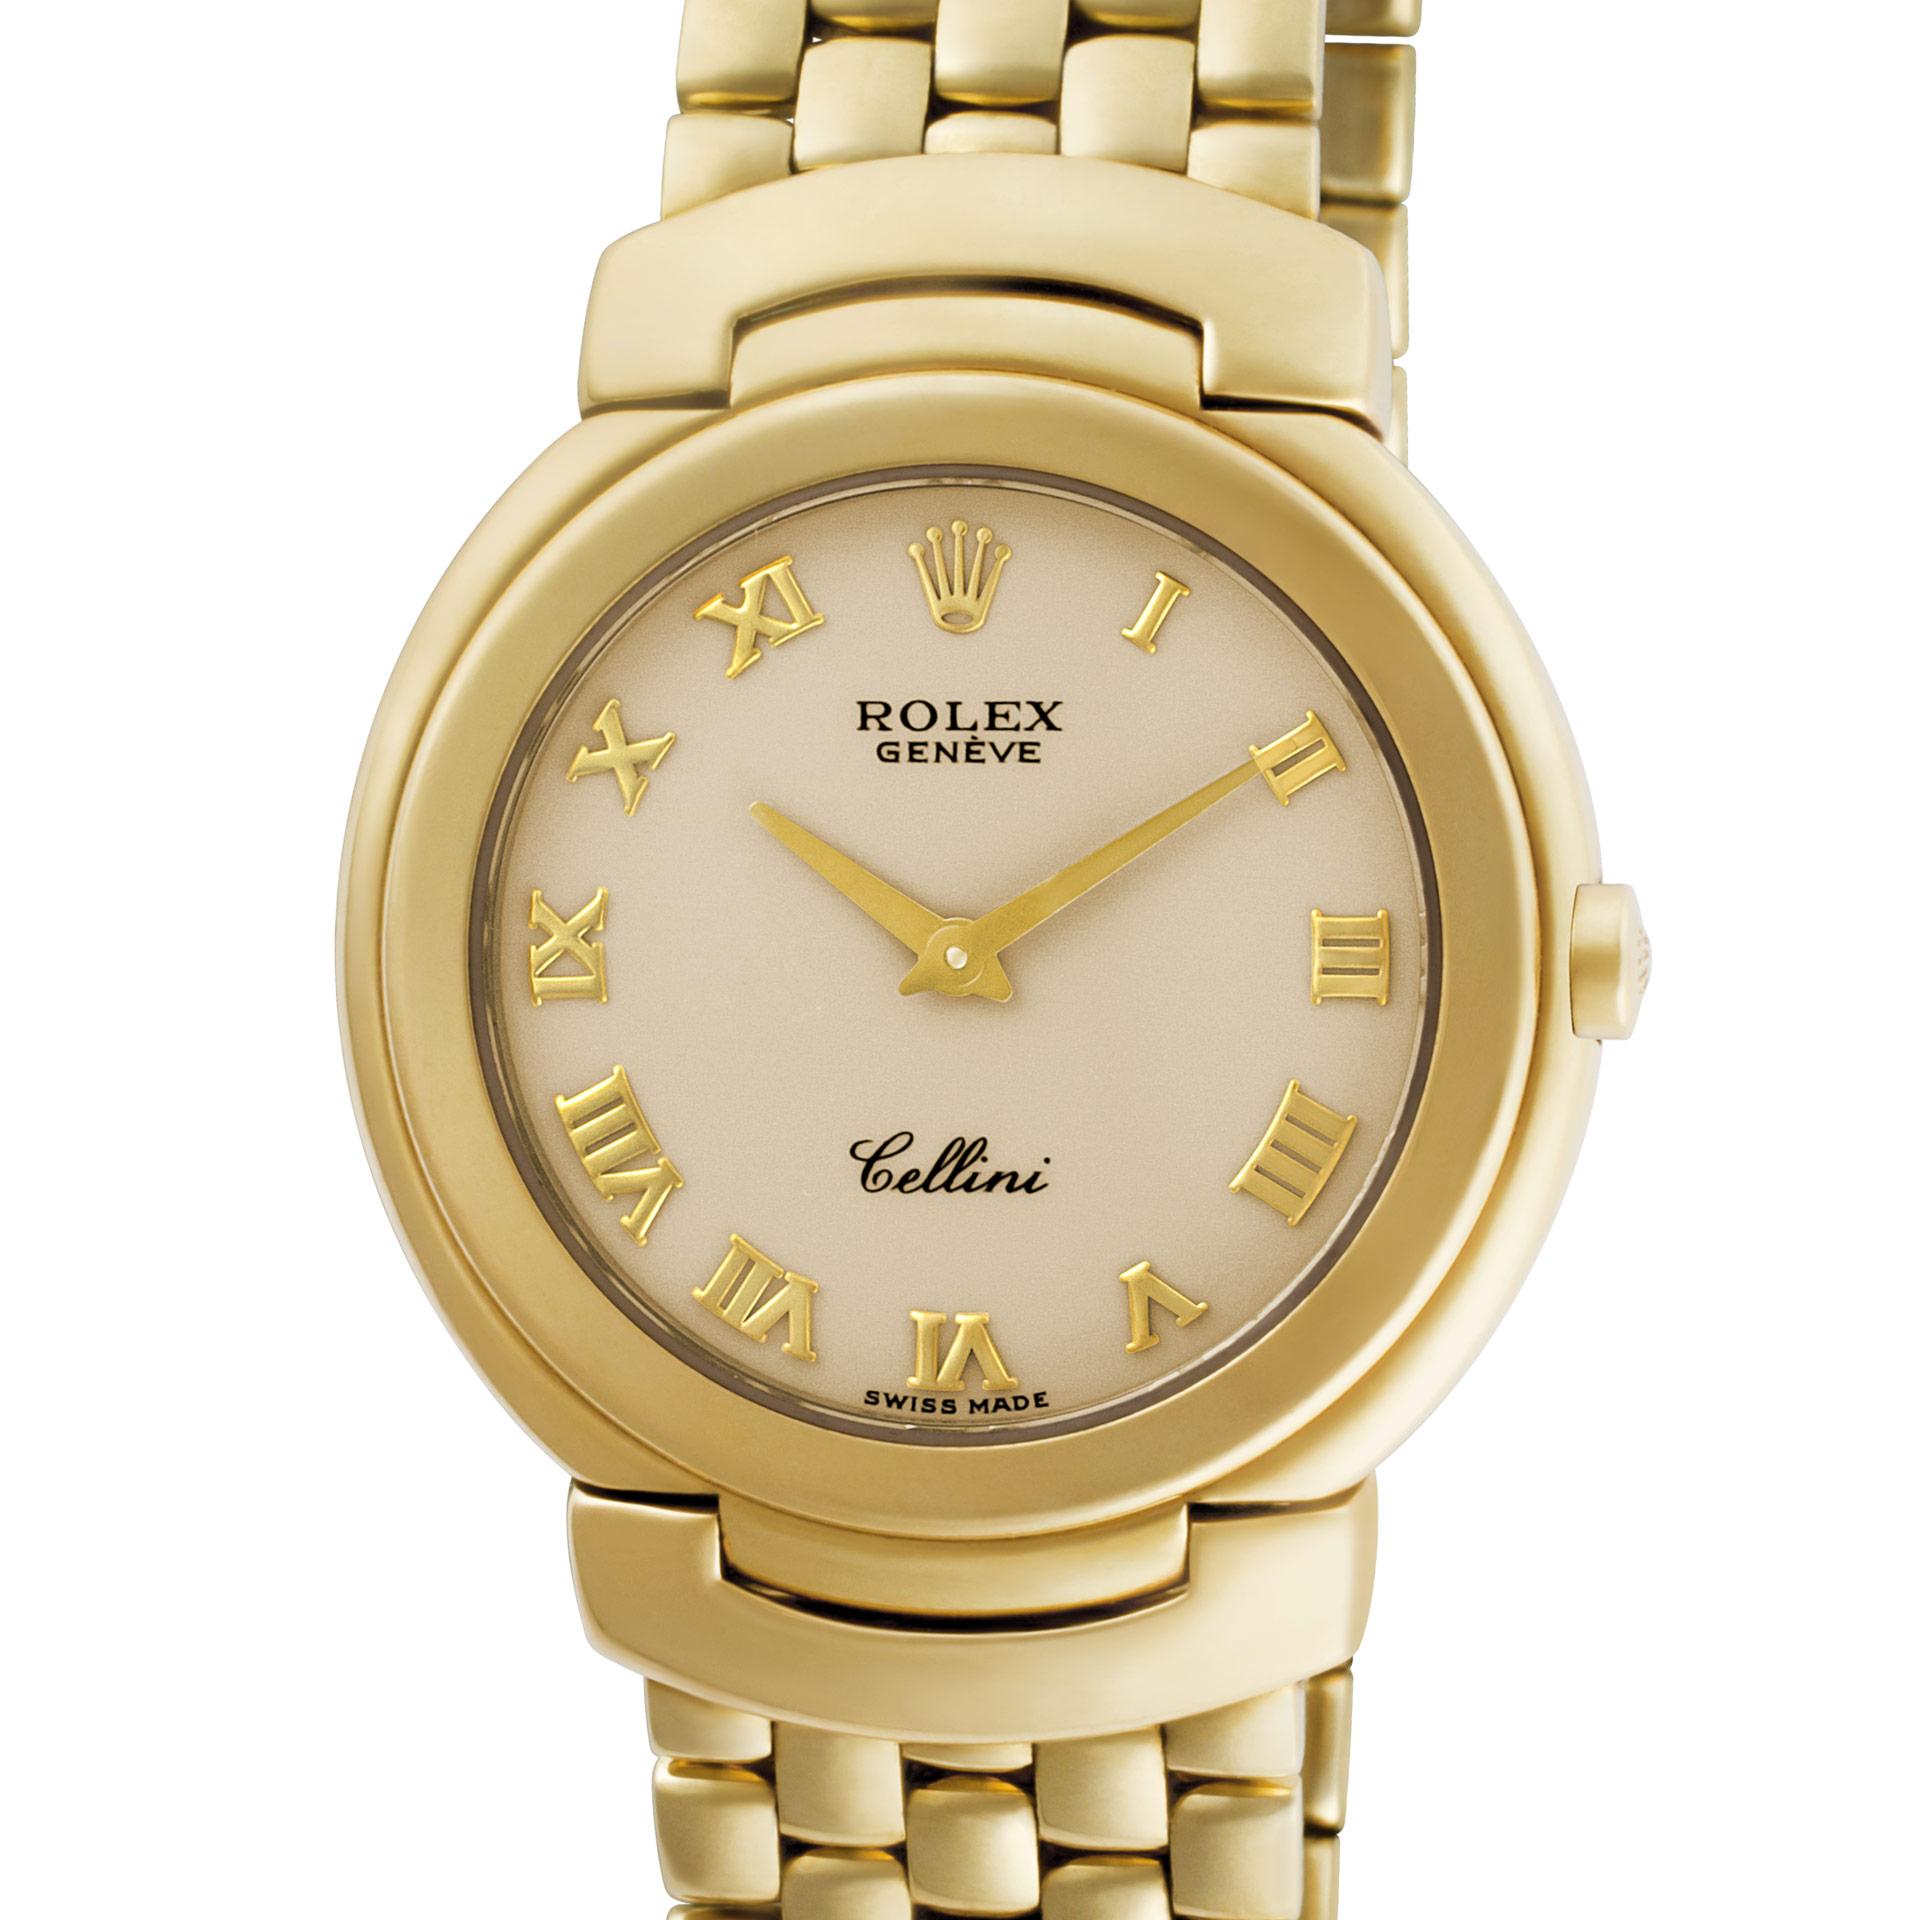 6622 Rolex WatchEbay Dial Cellini 18k Cream Quartz 30mm USzMpV